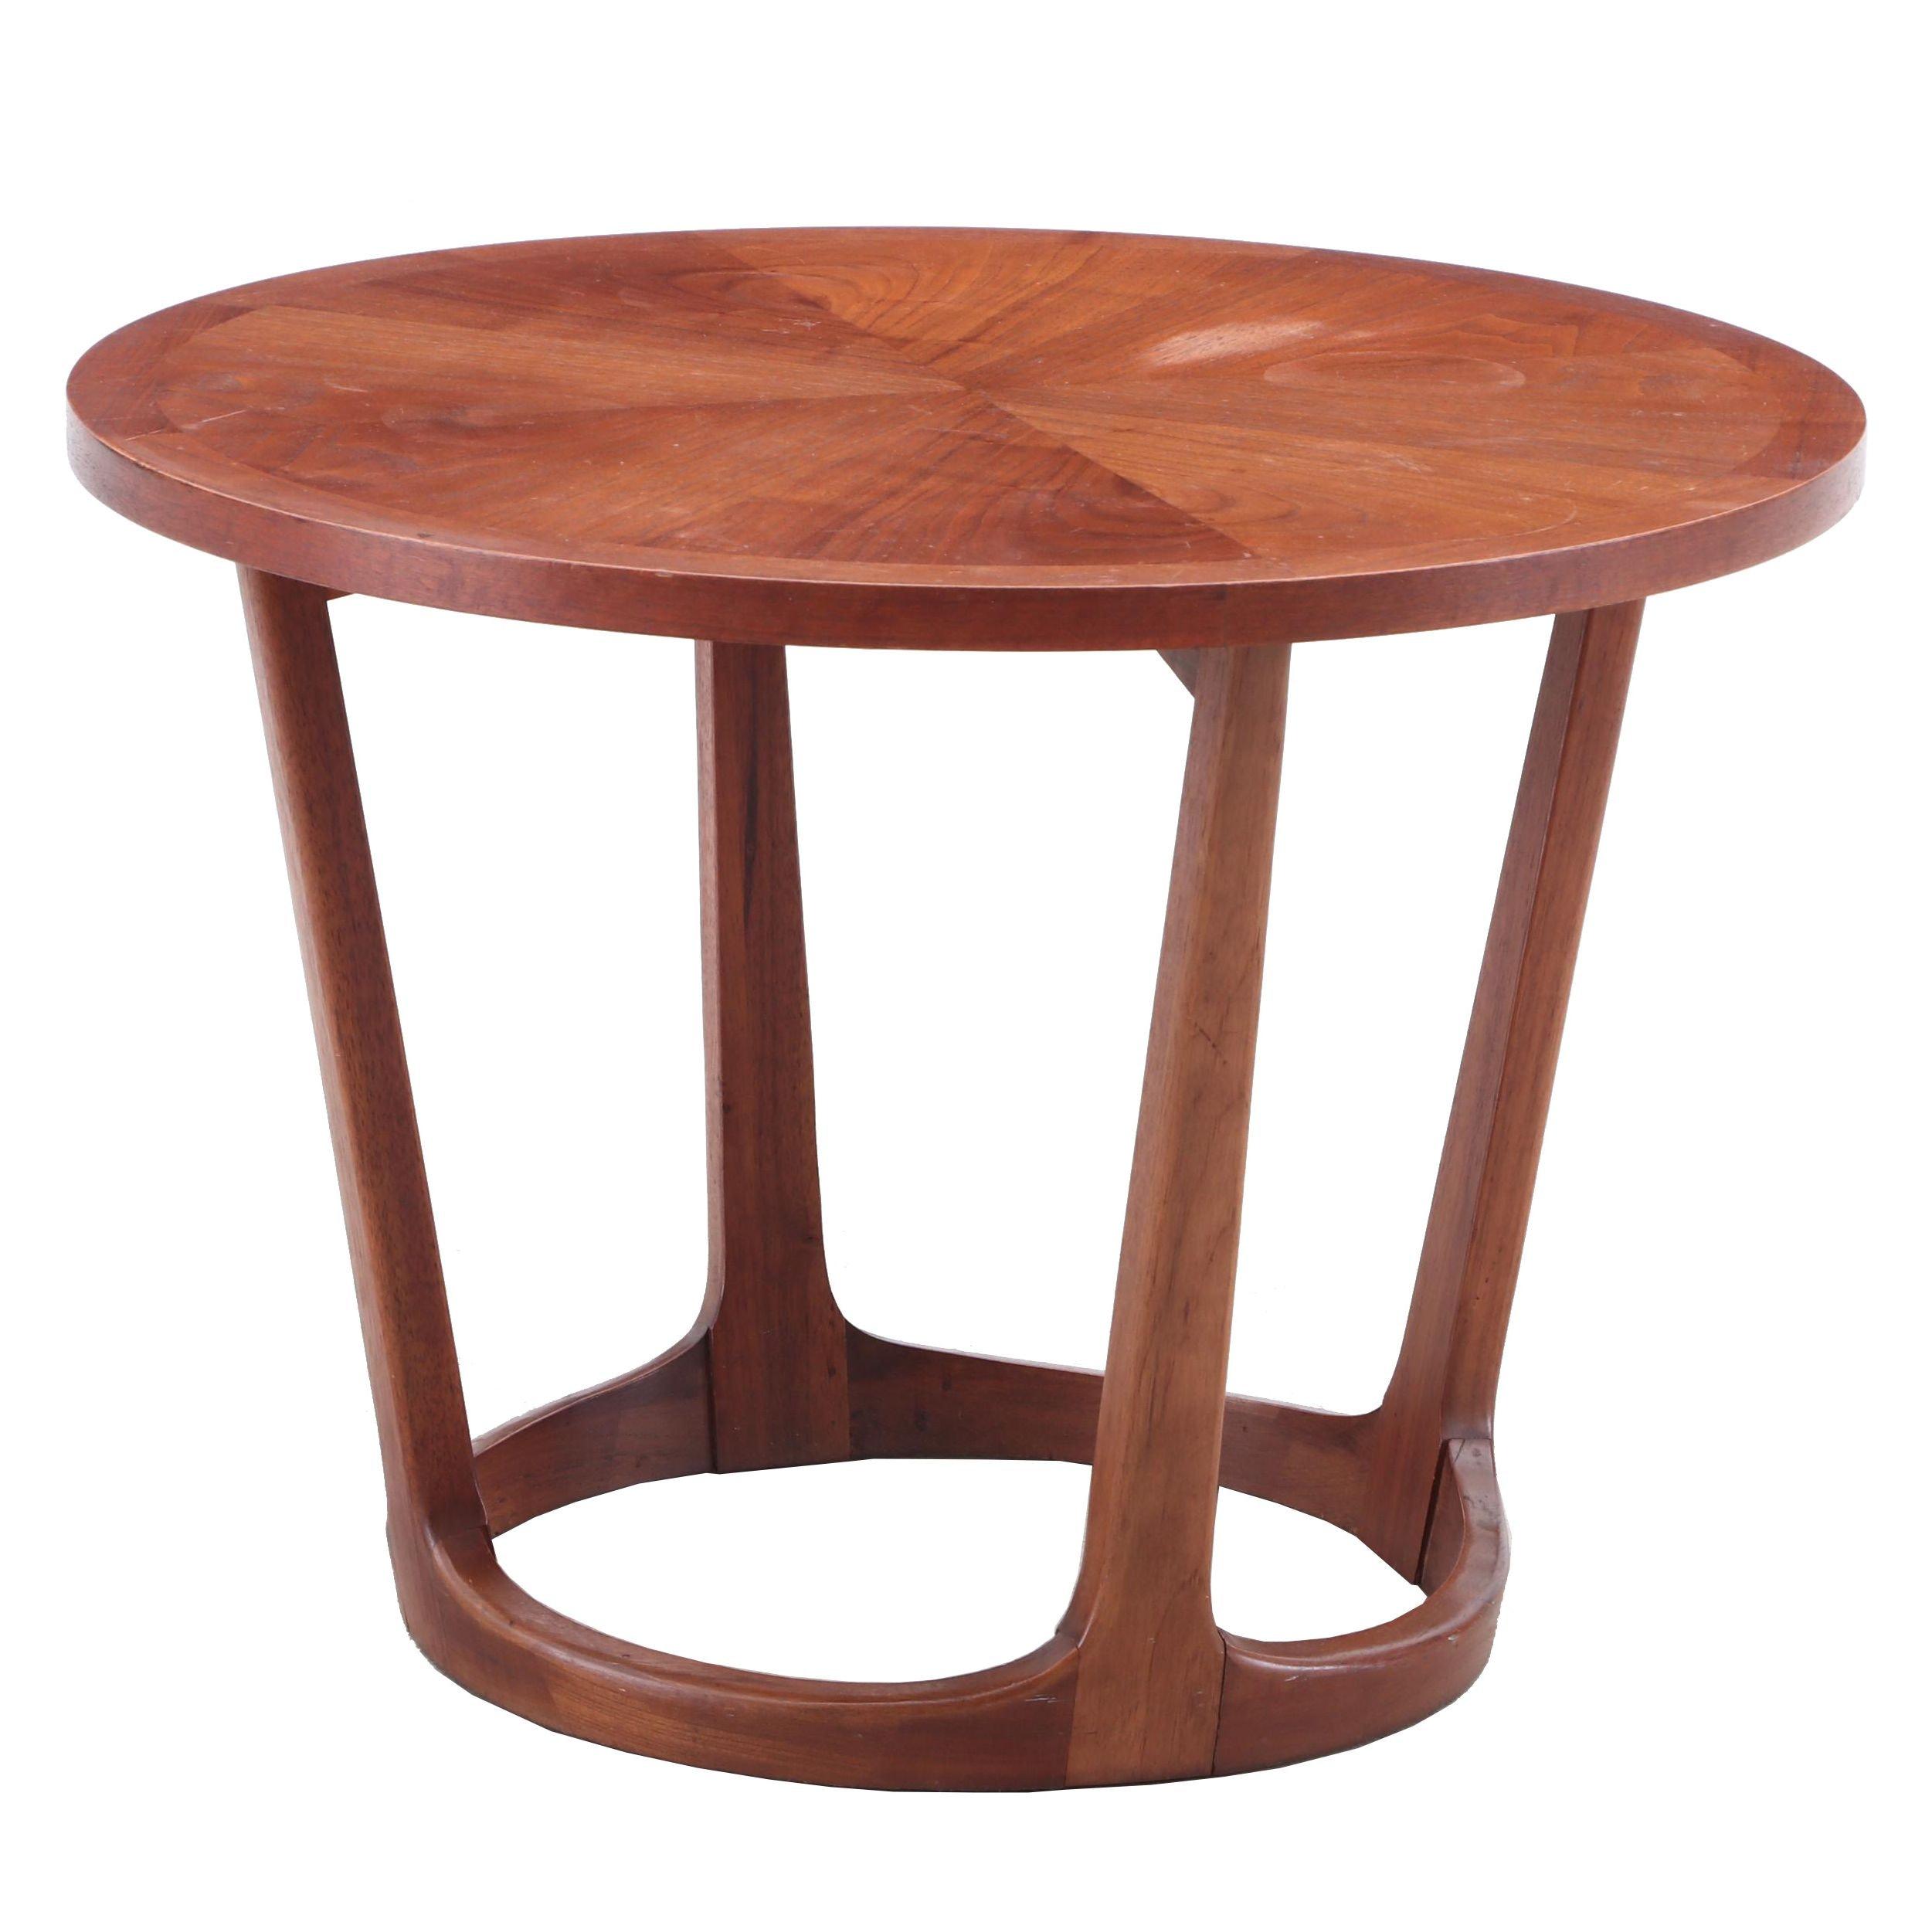 Mid Century Modern Walnut Coffee Table by Lane, 1962